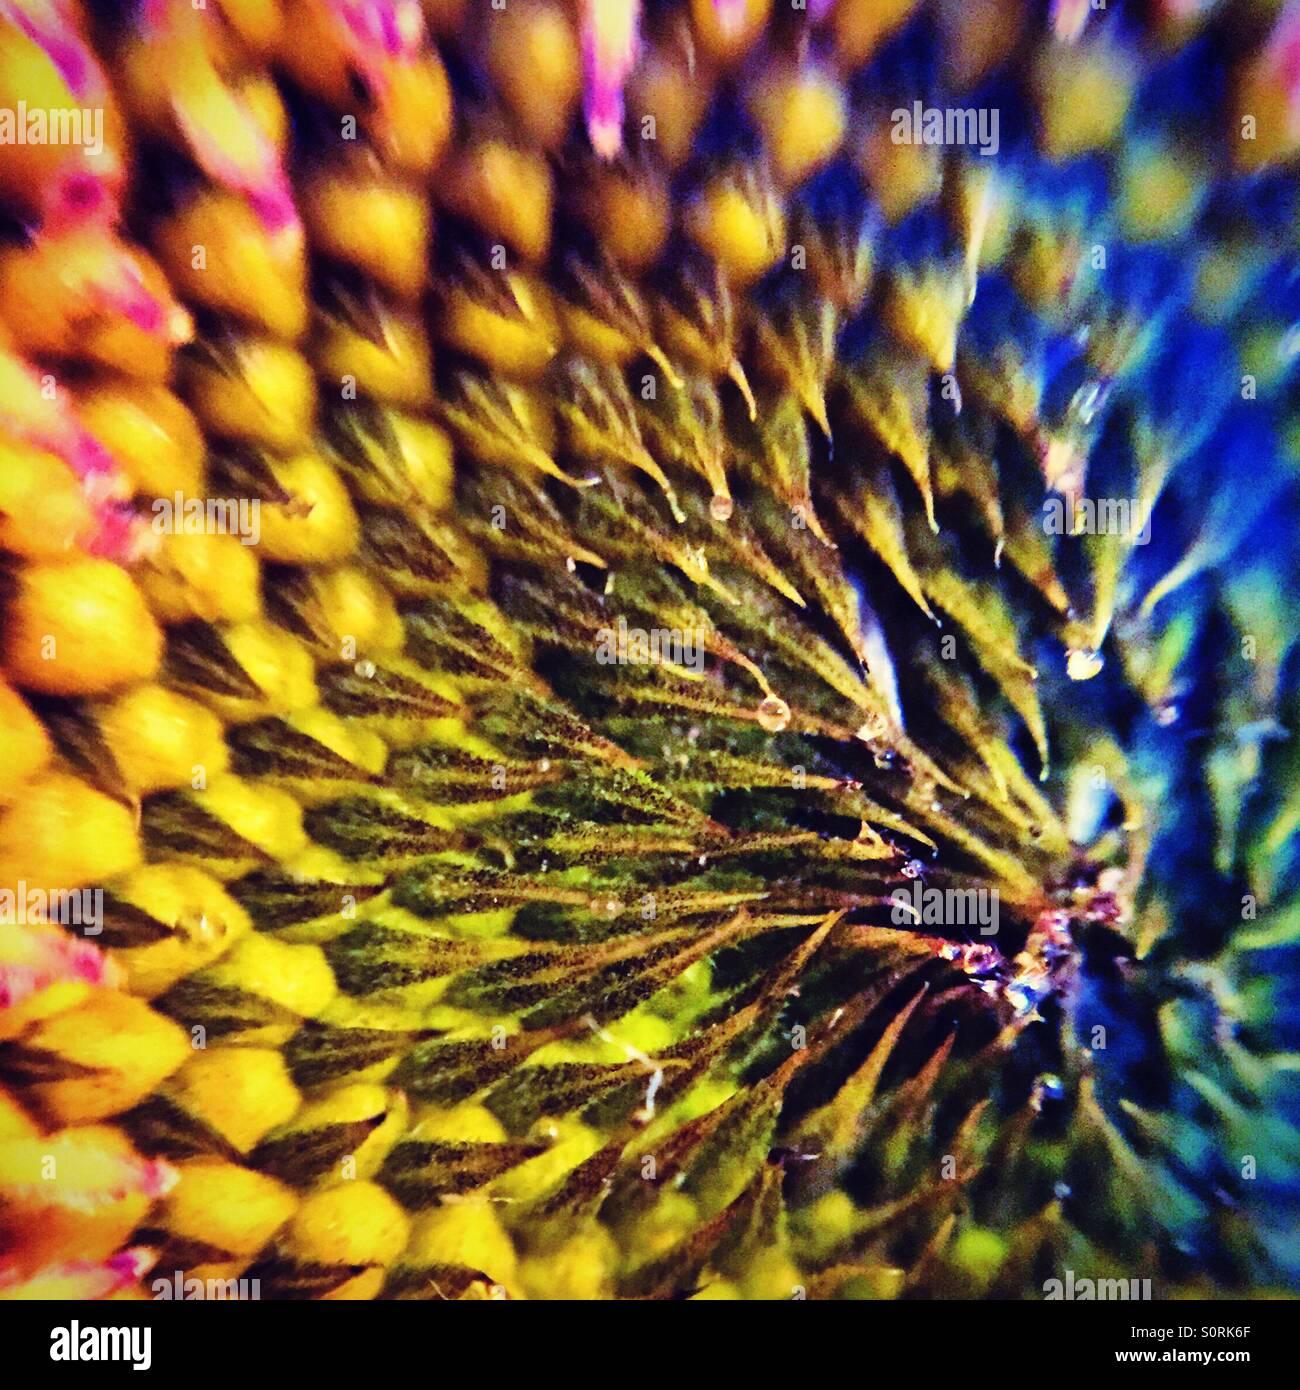 fibonacci nside of a colorful flower stock photo 310306599 alamy